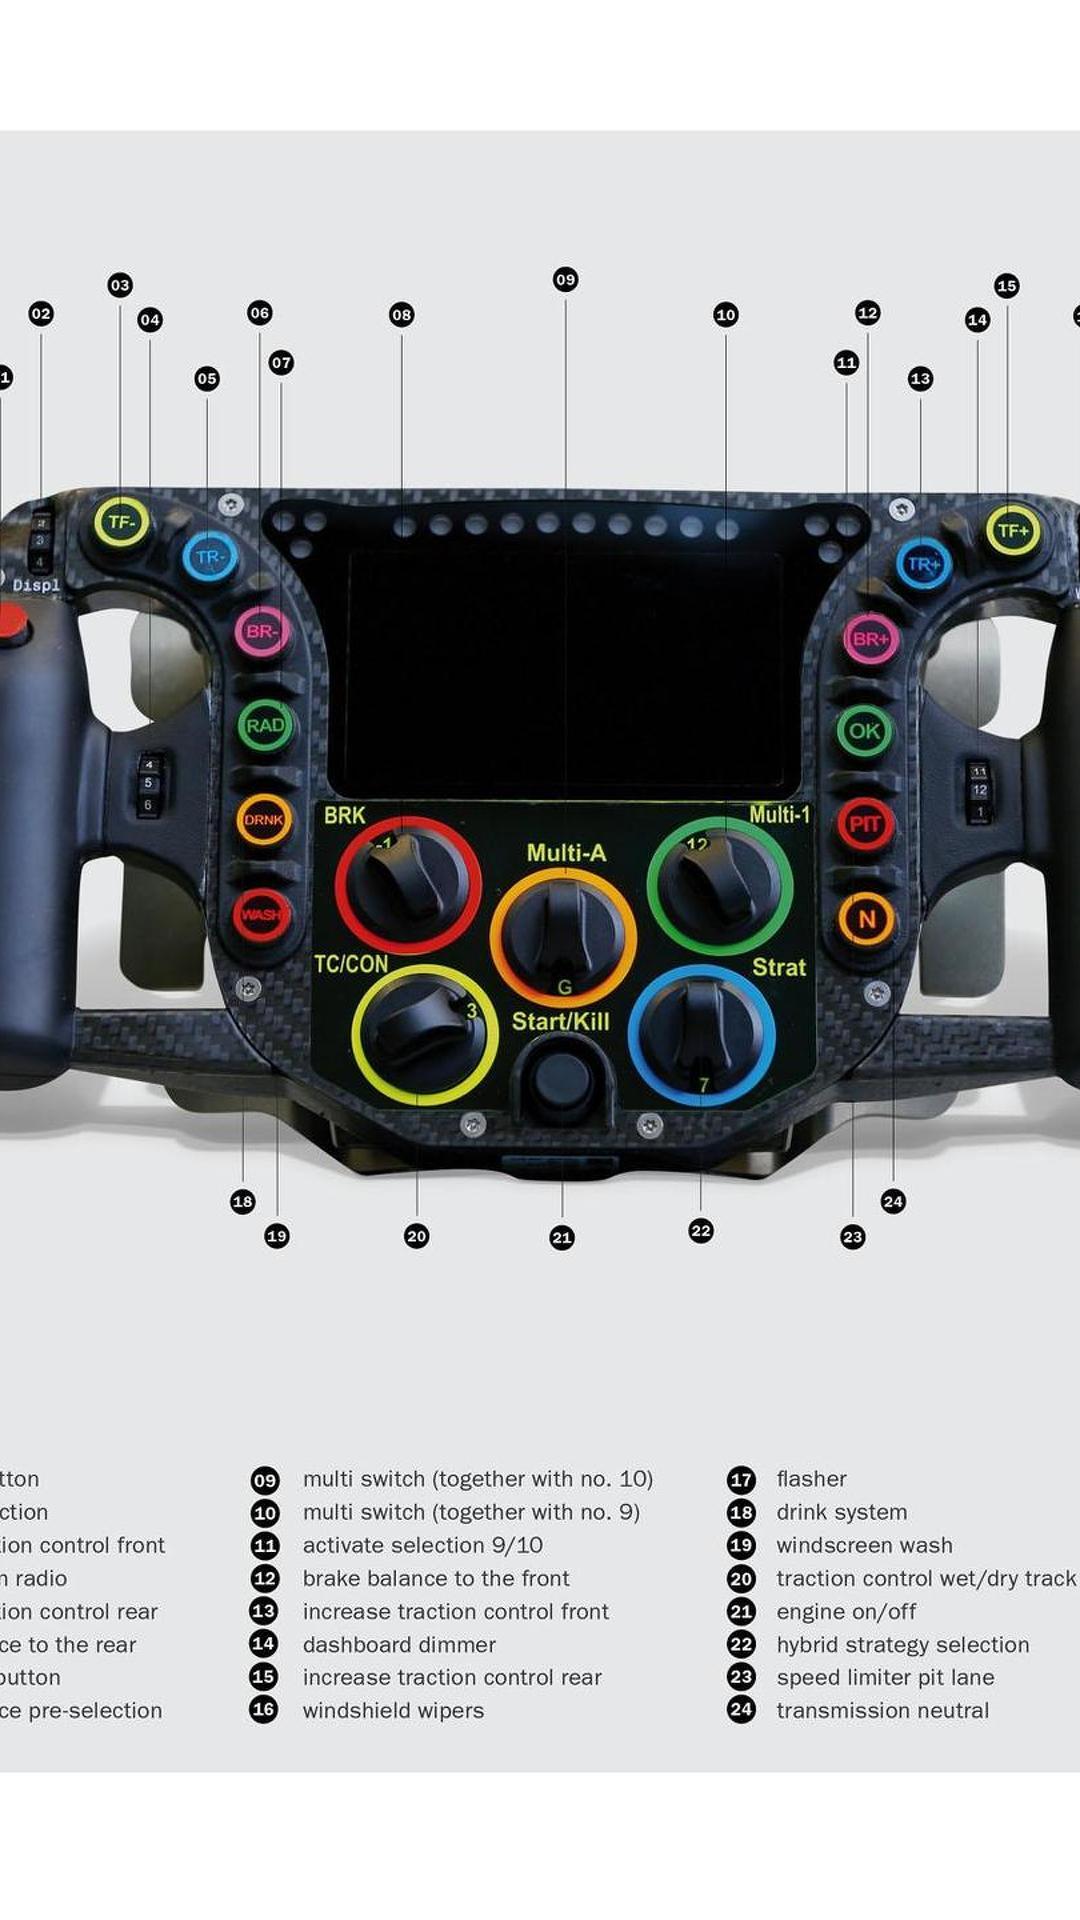 Porsche highlights the insane steering wheel on the 919 Hybrid